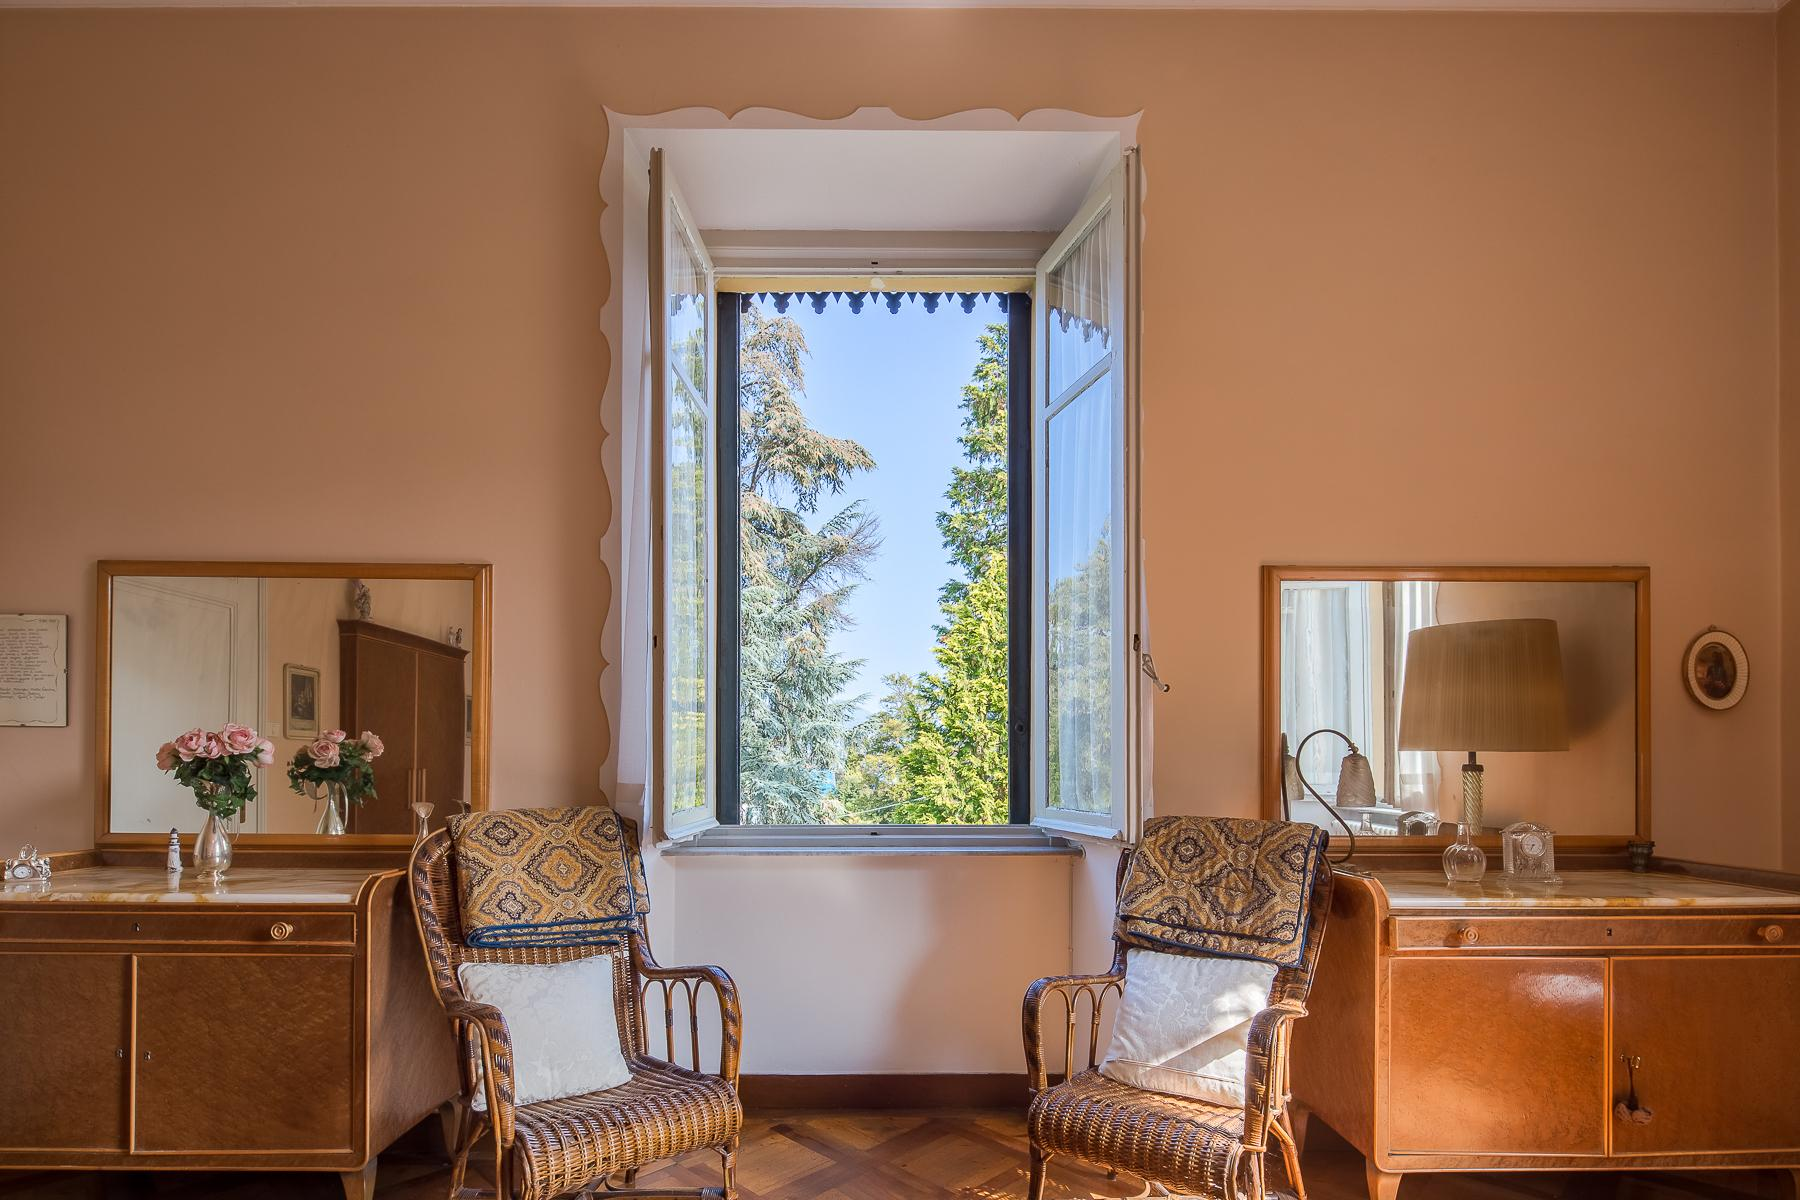 Stresa的历史中心的别墅 - 1